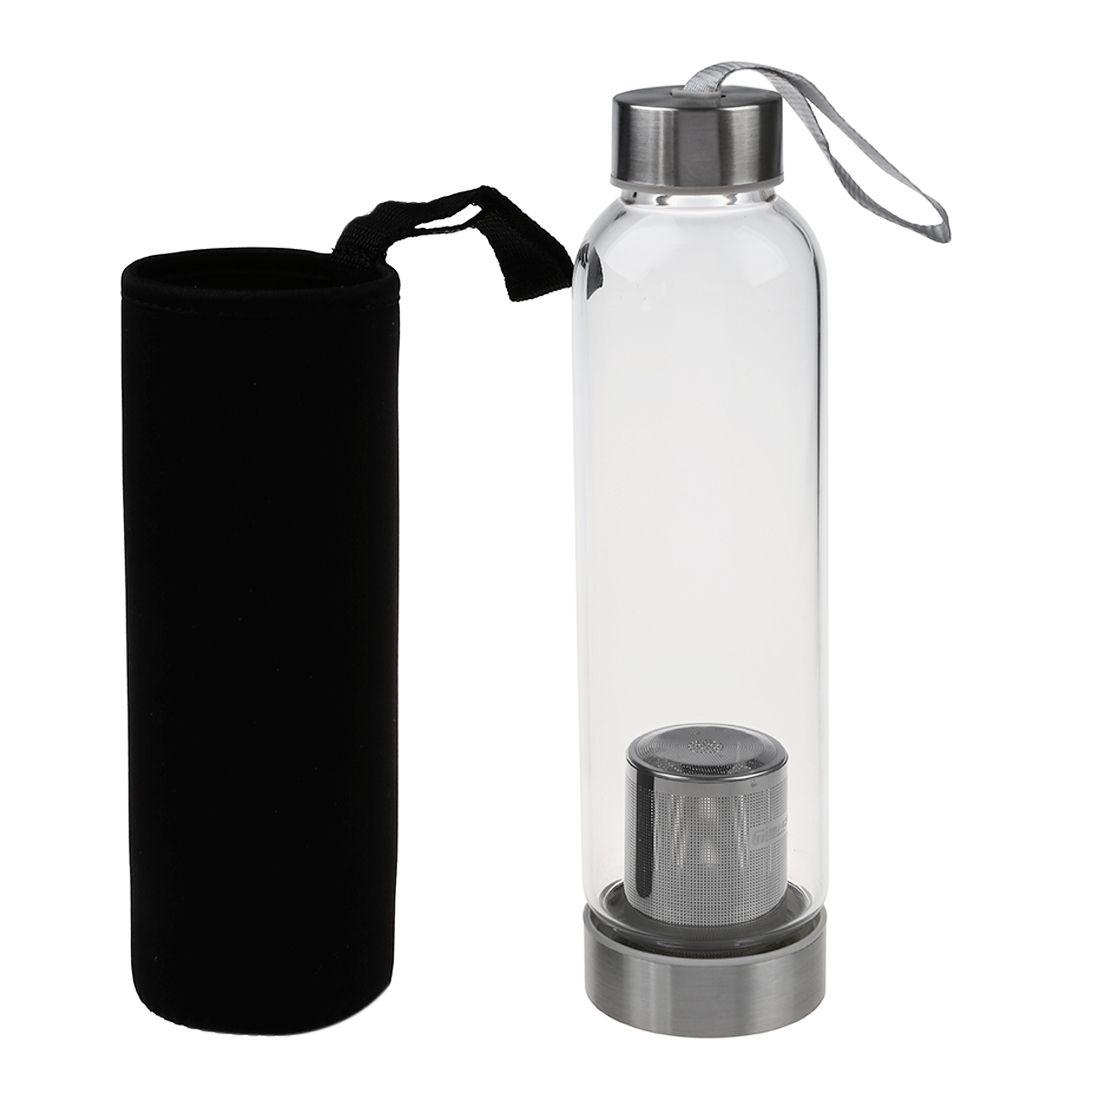 Botella de agua deportiva de vidrio caliente con filtro de té Infusor bolsa protectora 550 ml